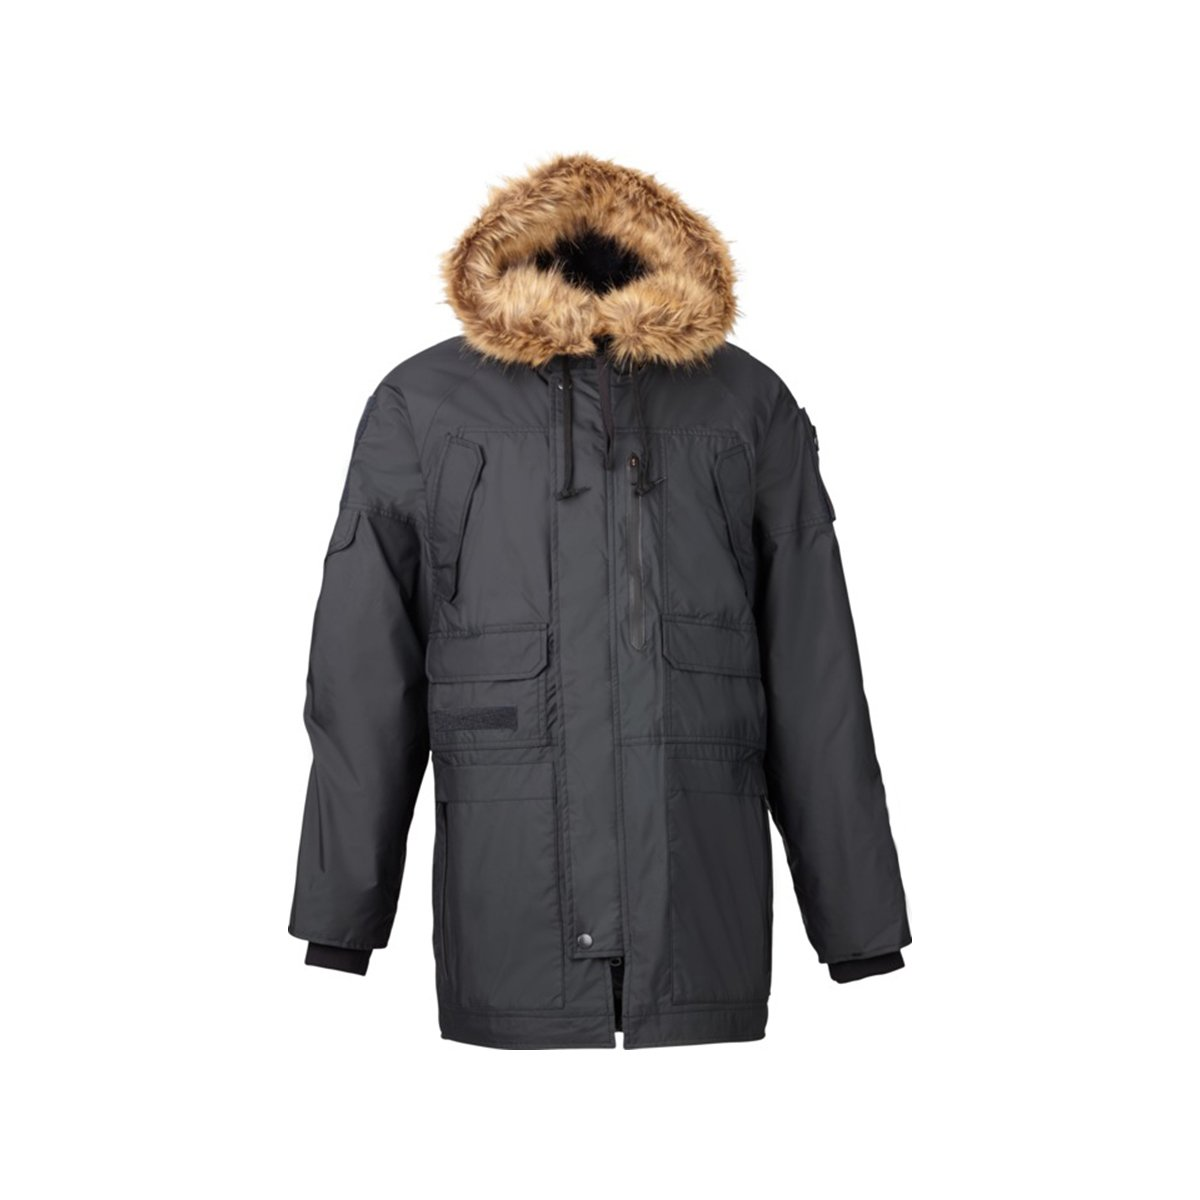 4d9ea636c Top 10 wholesale 1950s Mens Clothing - Chinabrands.com